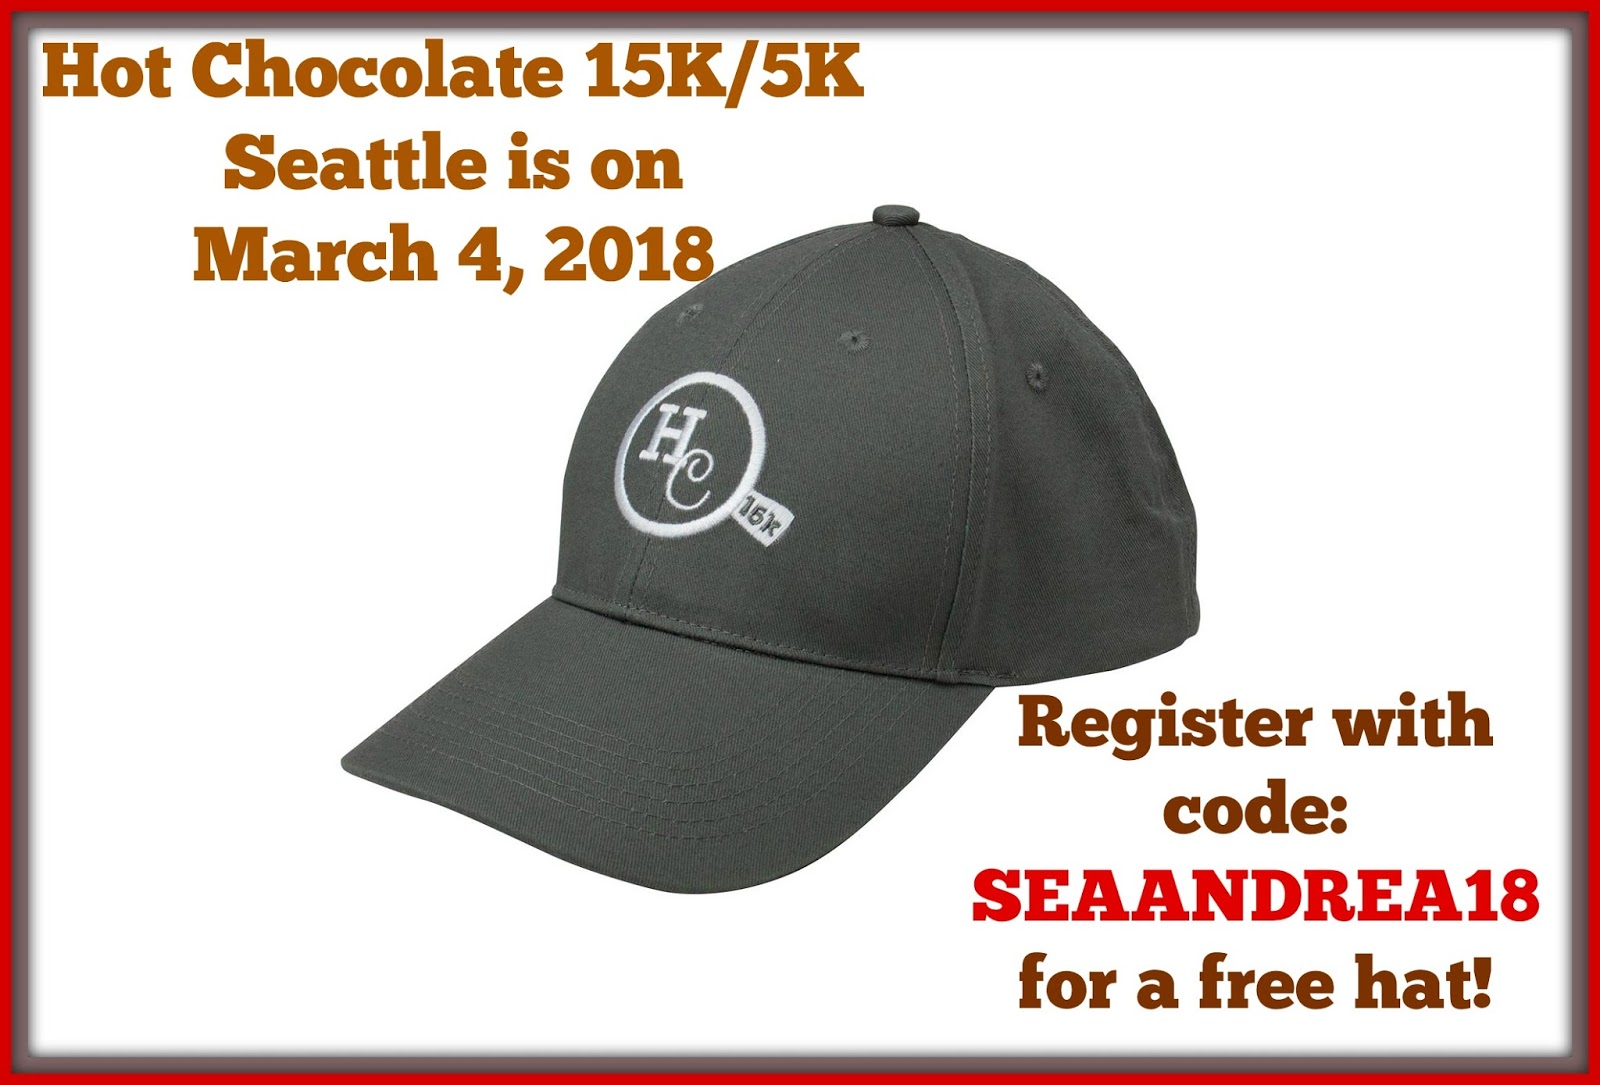 Hot Chocolate 15k/5k San Diego